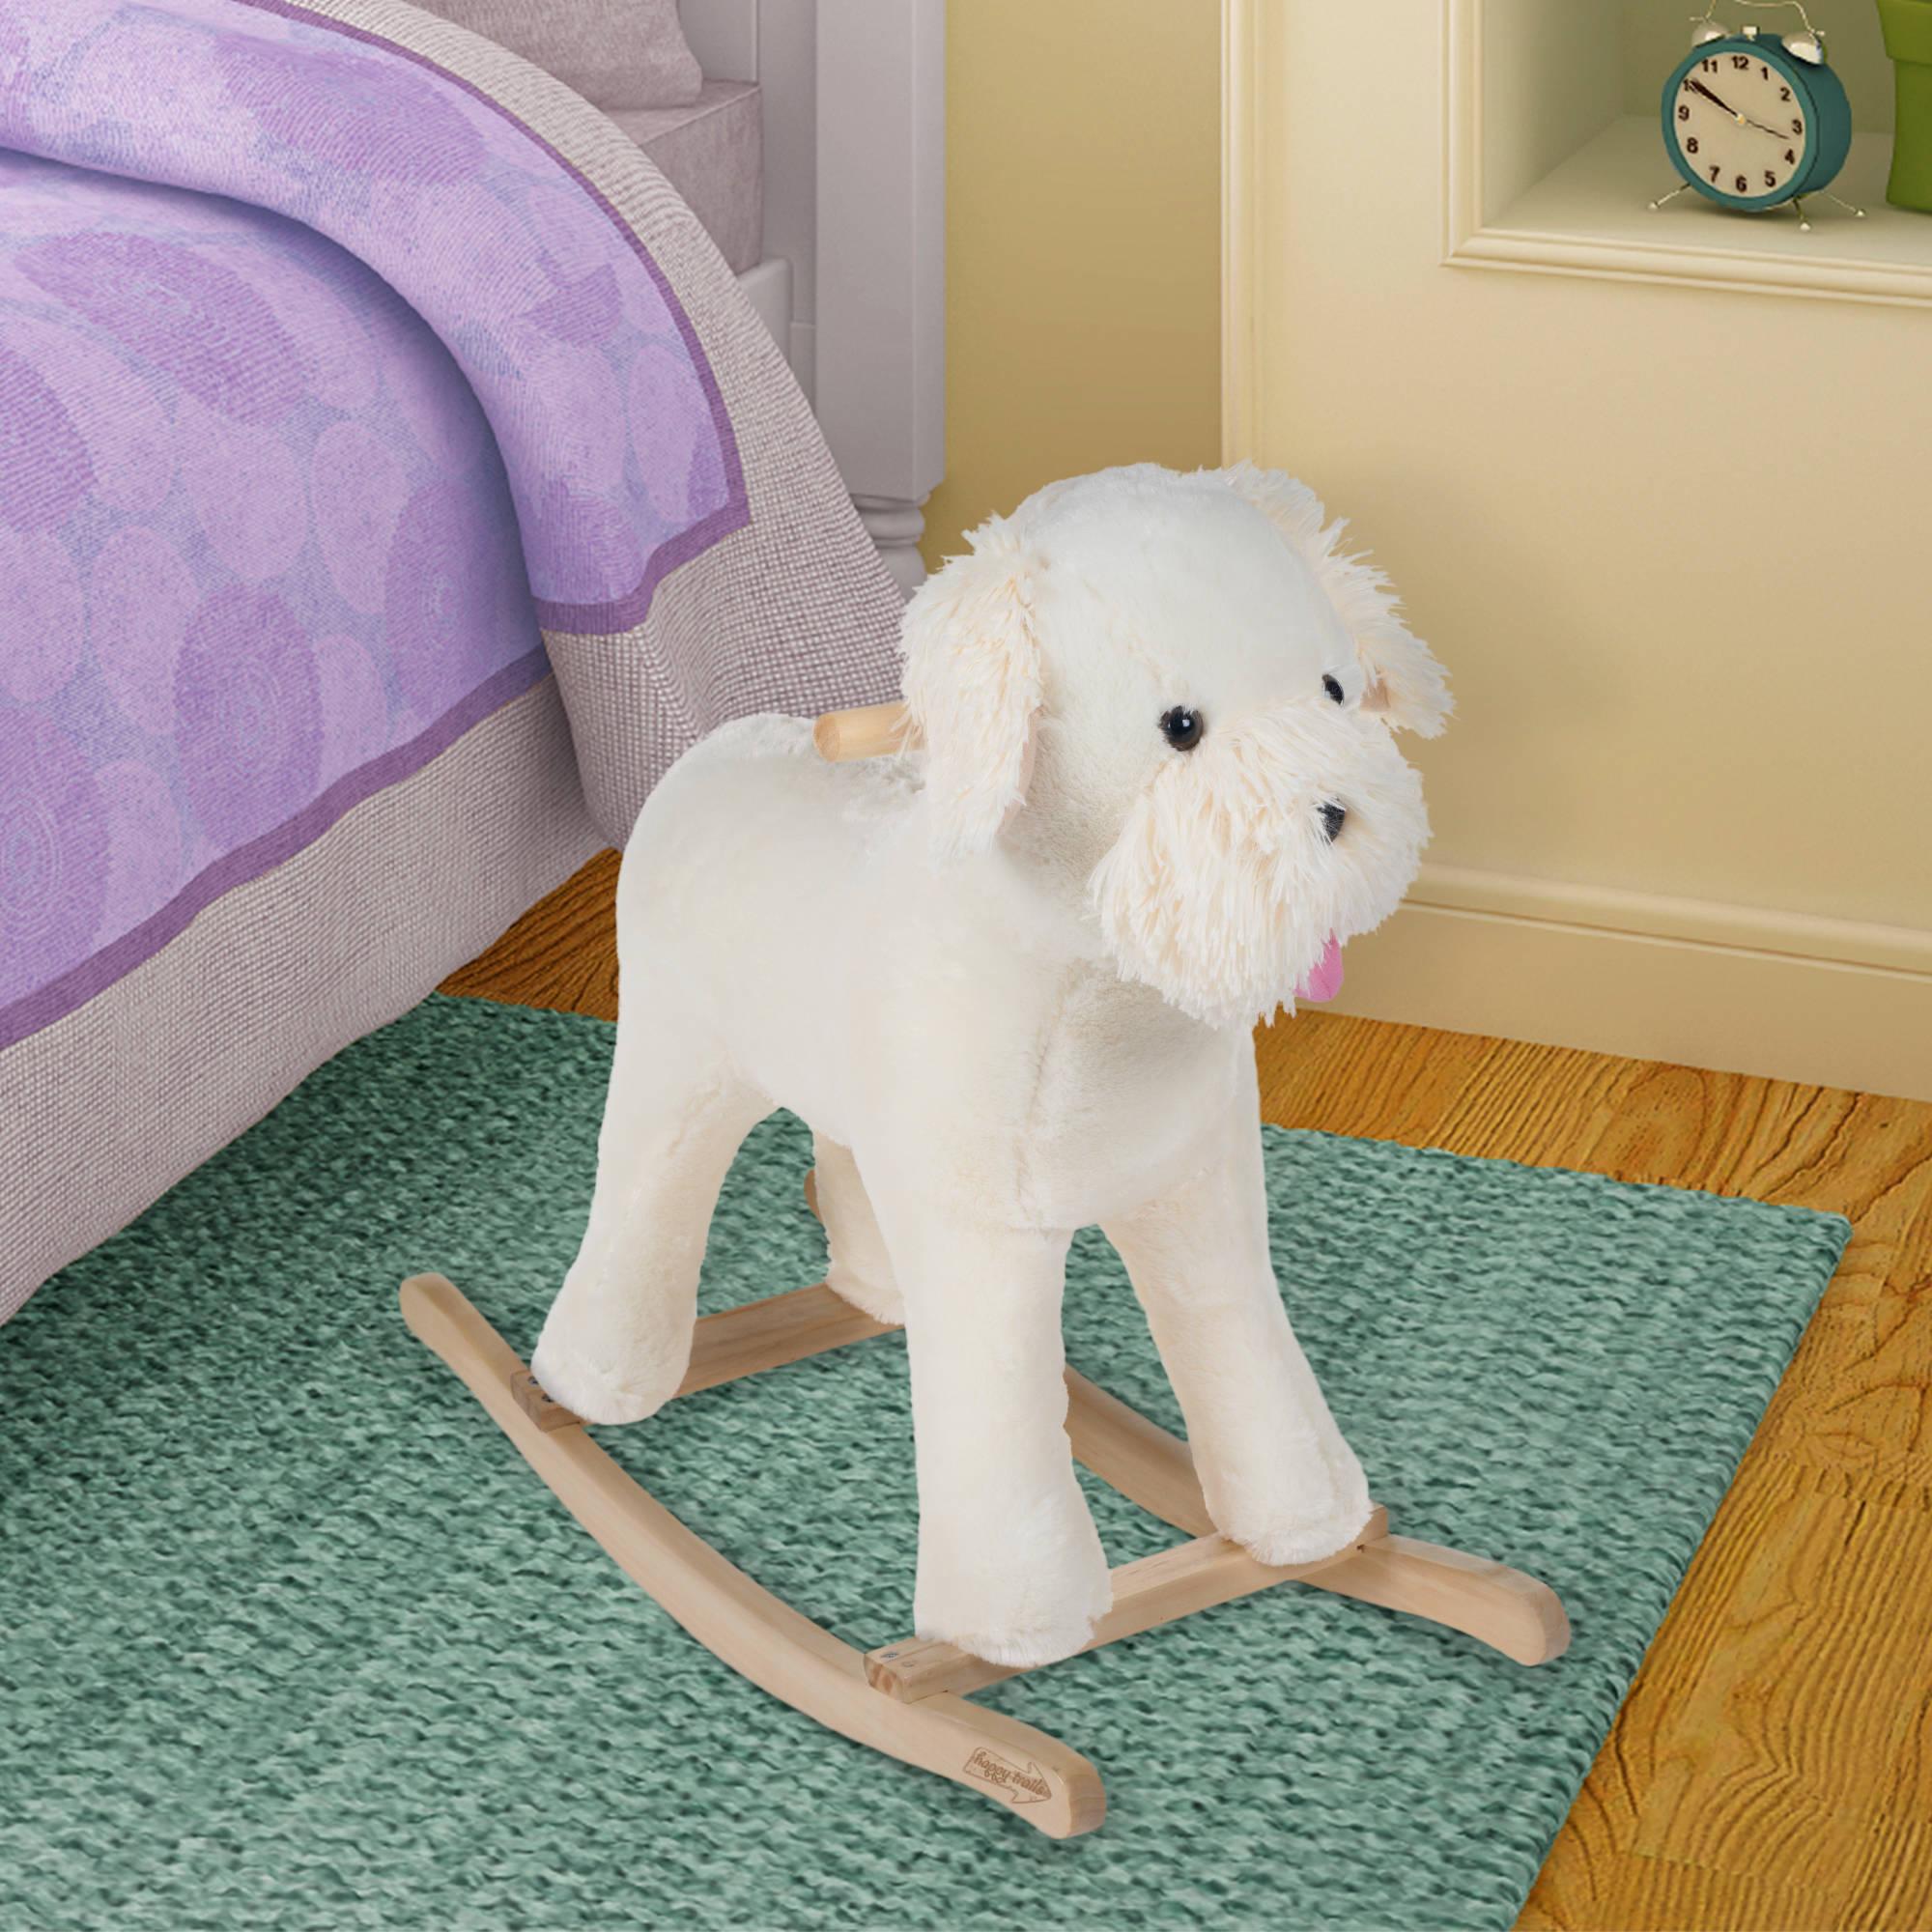 Happy Trails Rocking Animal, White Dog